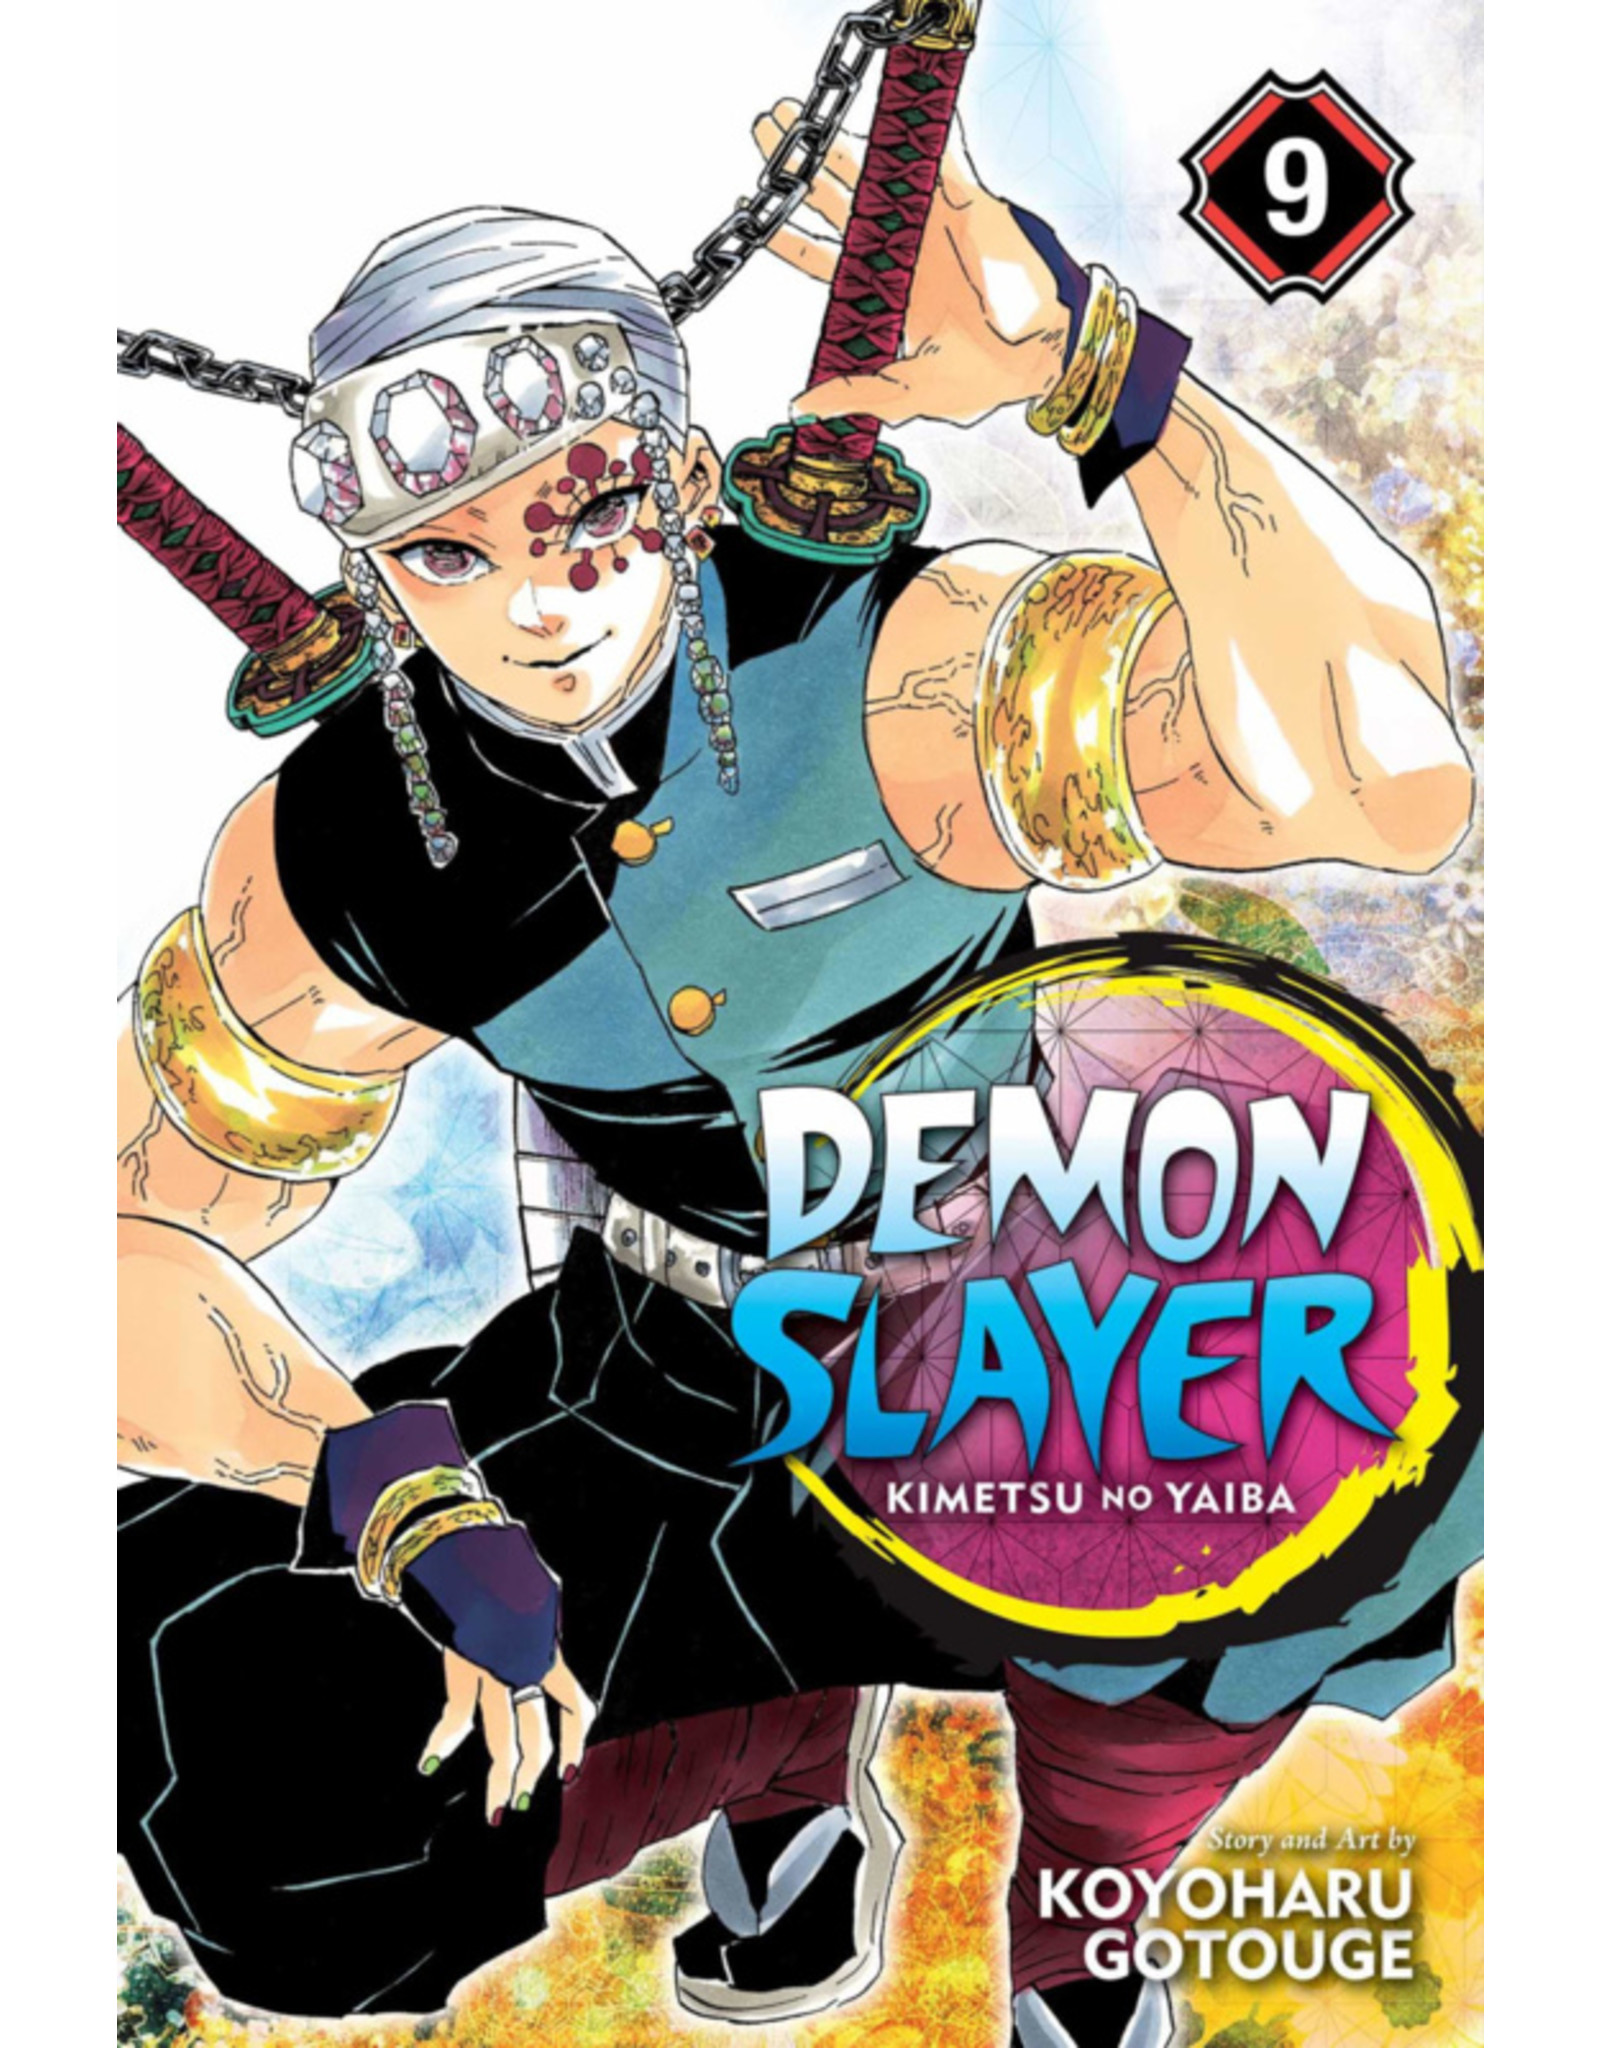 Demon Slayer Volume 09 (English version)